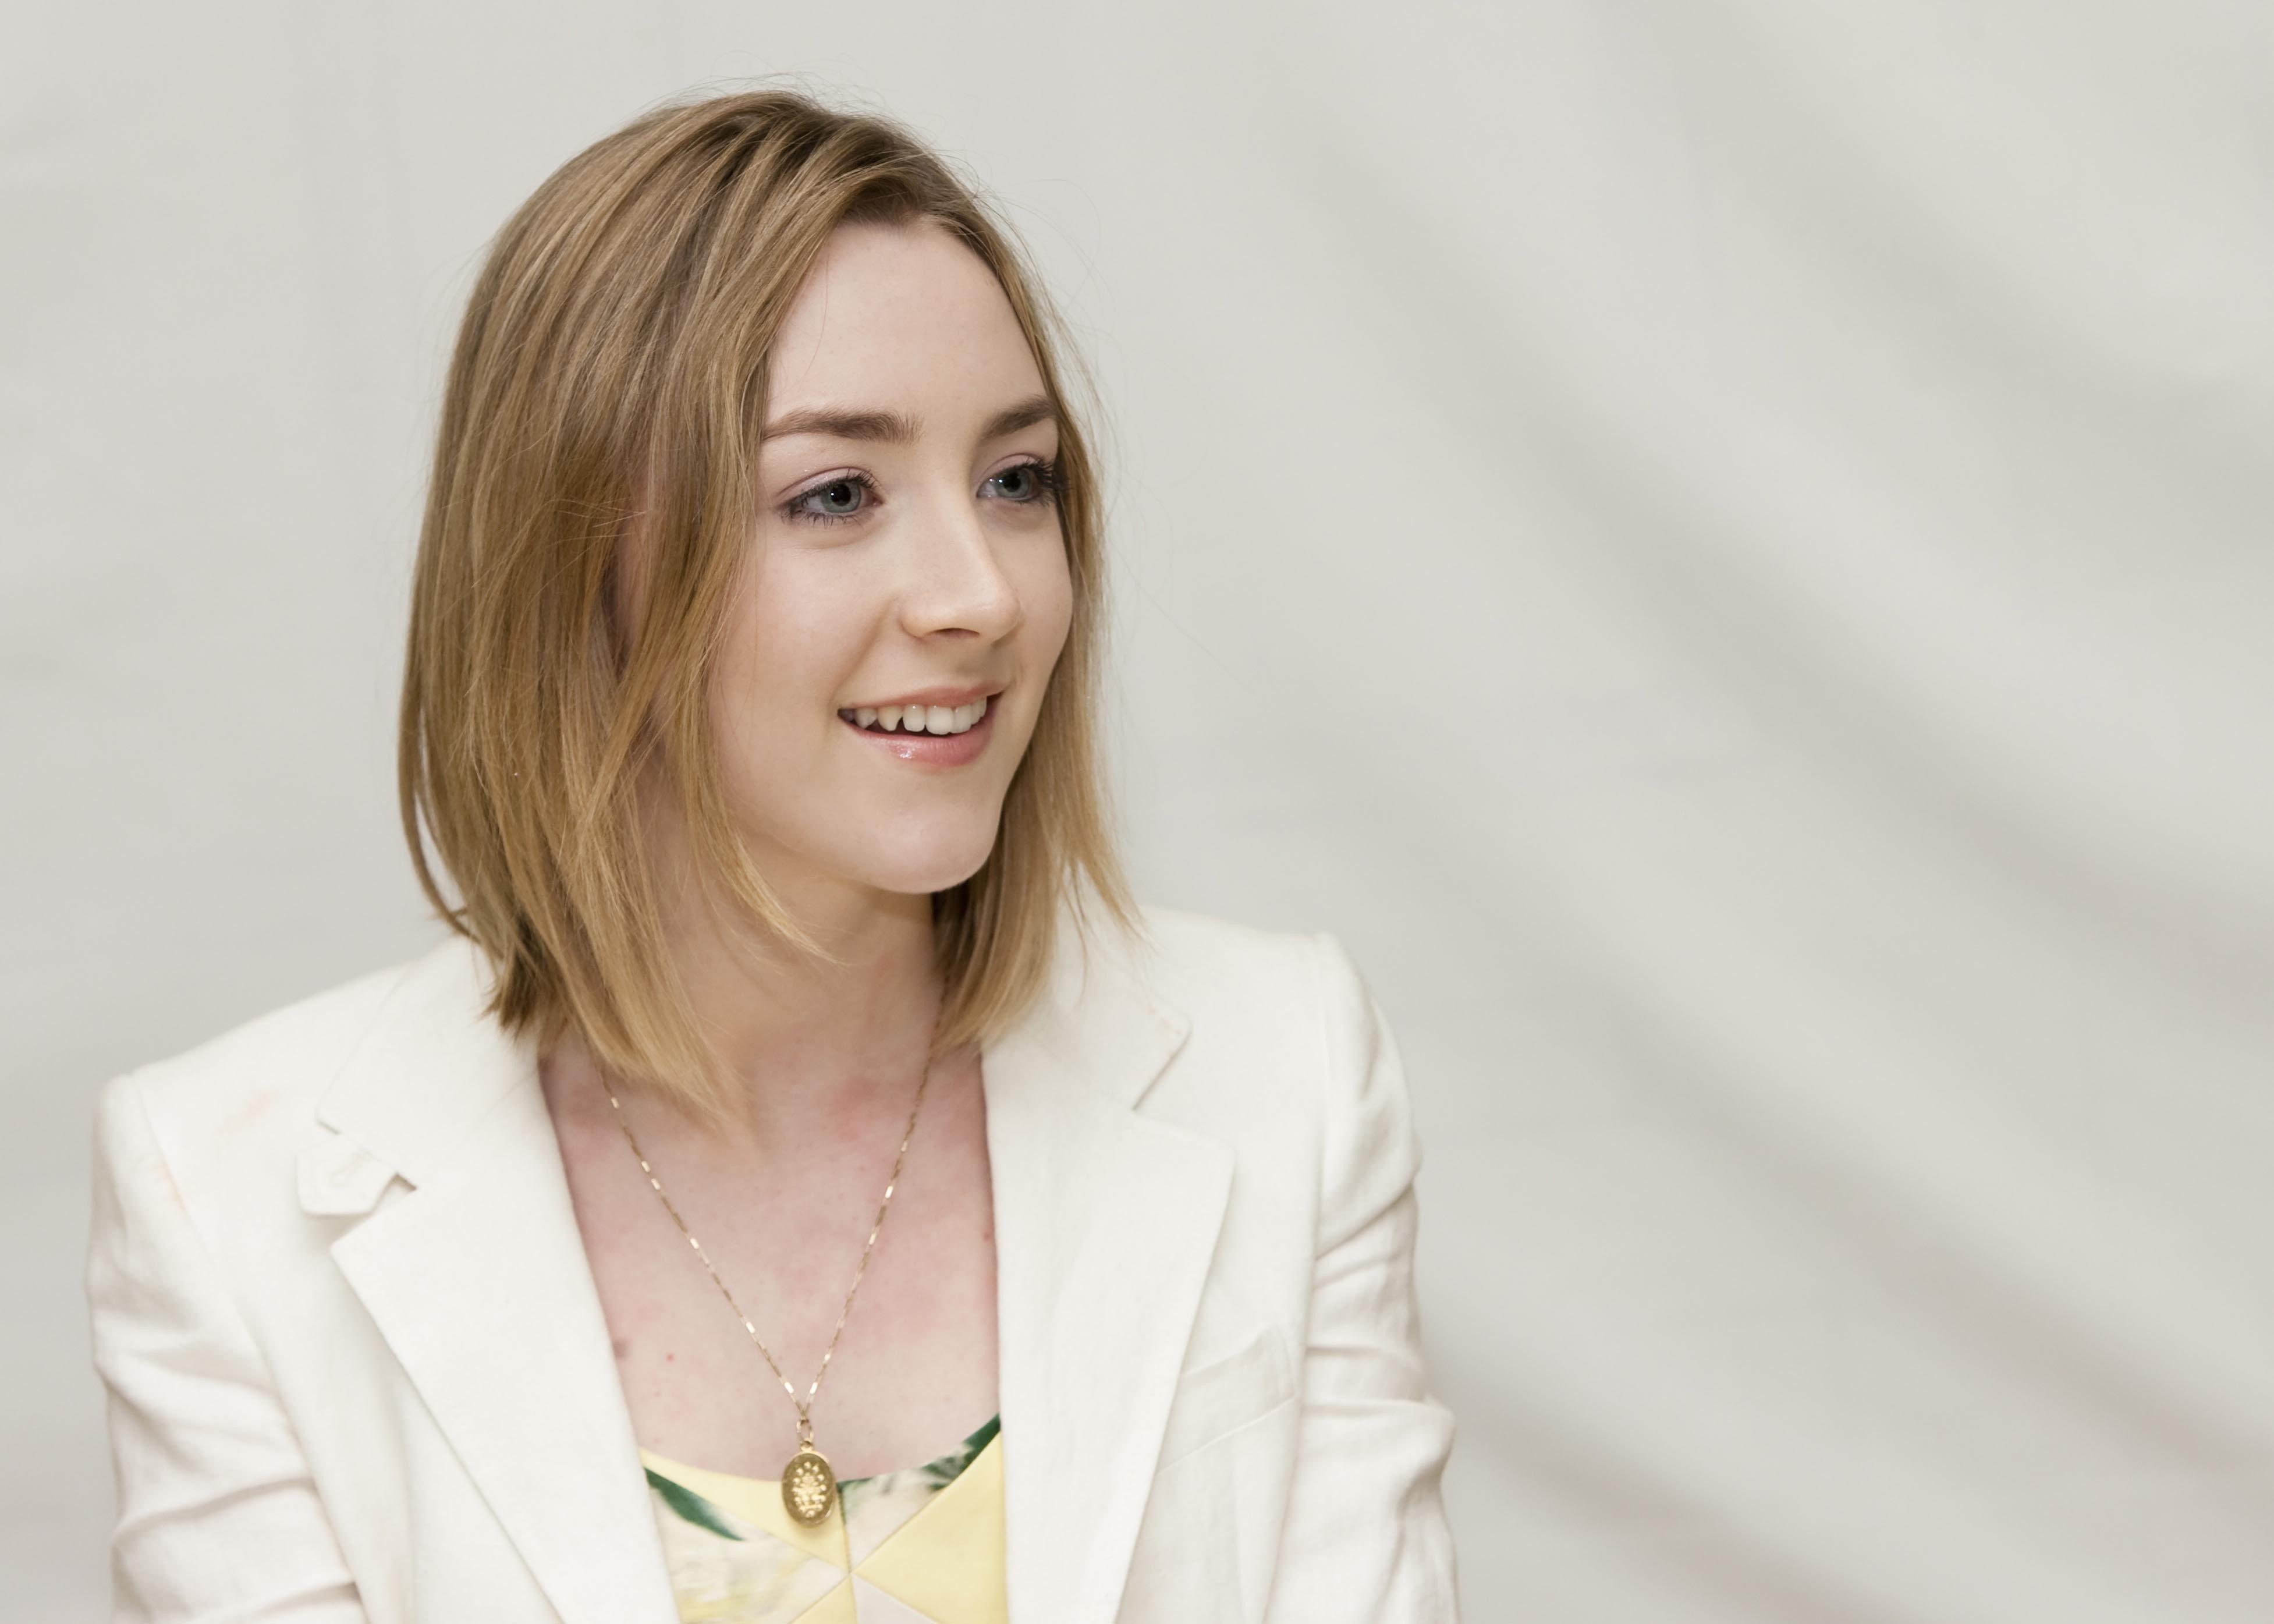 women, Celebrity, Saoirse Ronan, Actress Wallpaper